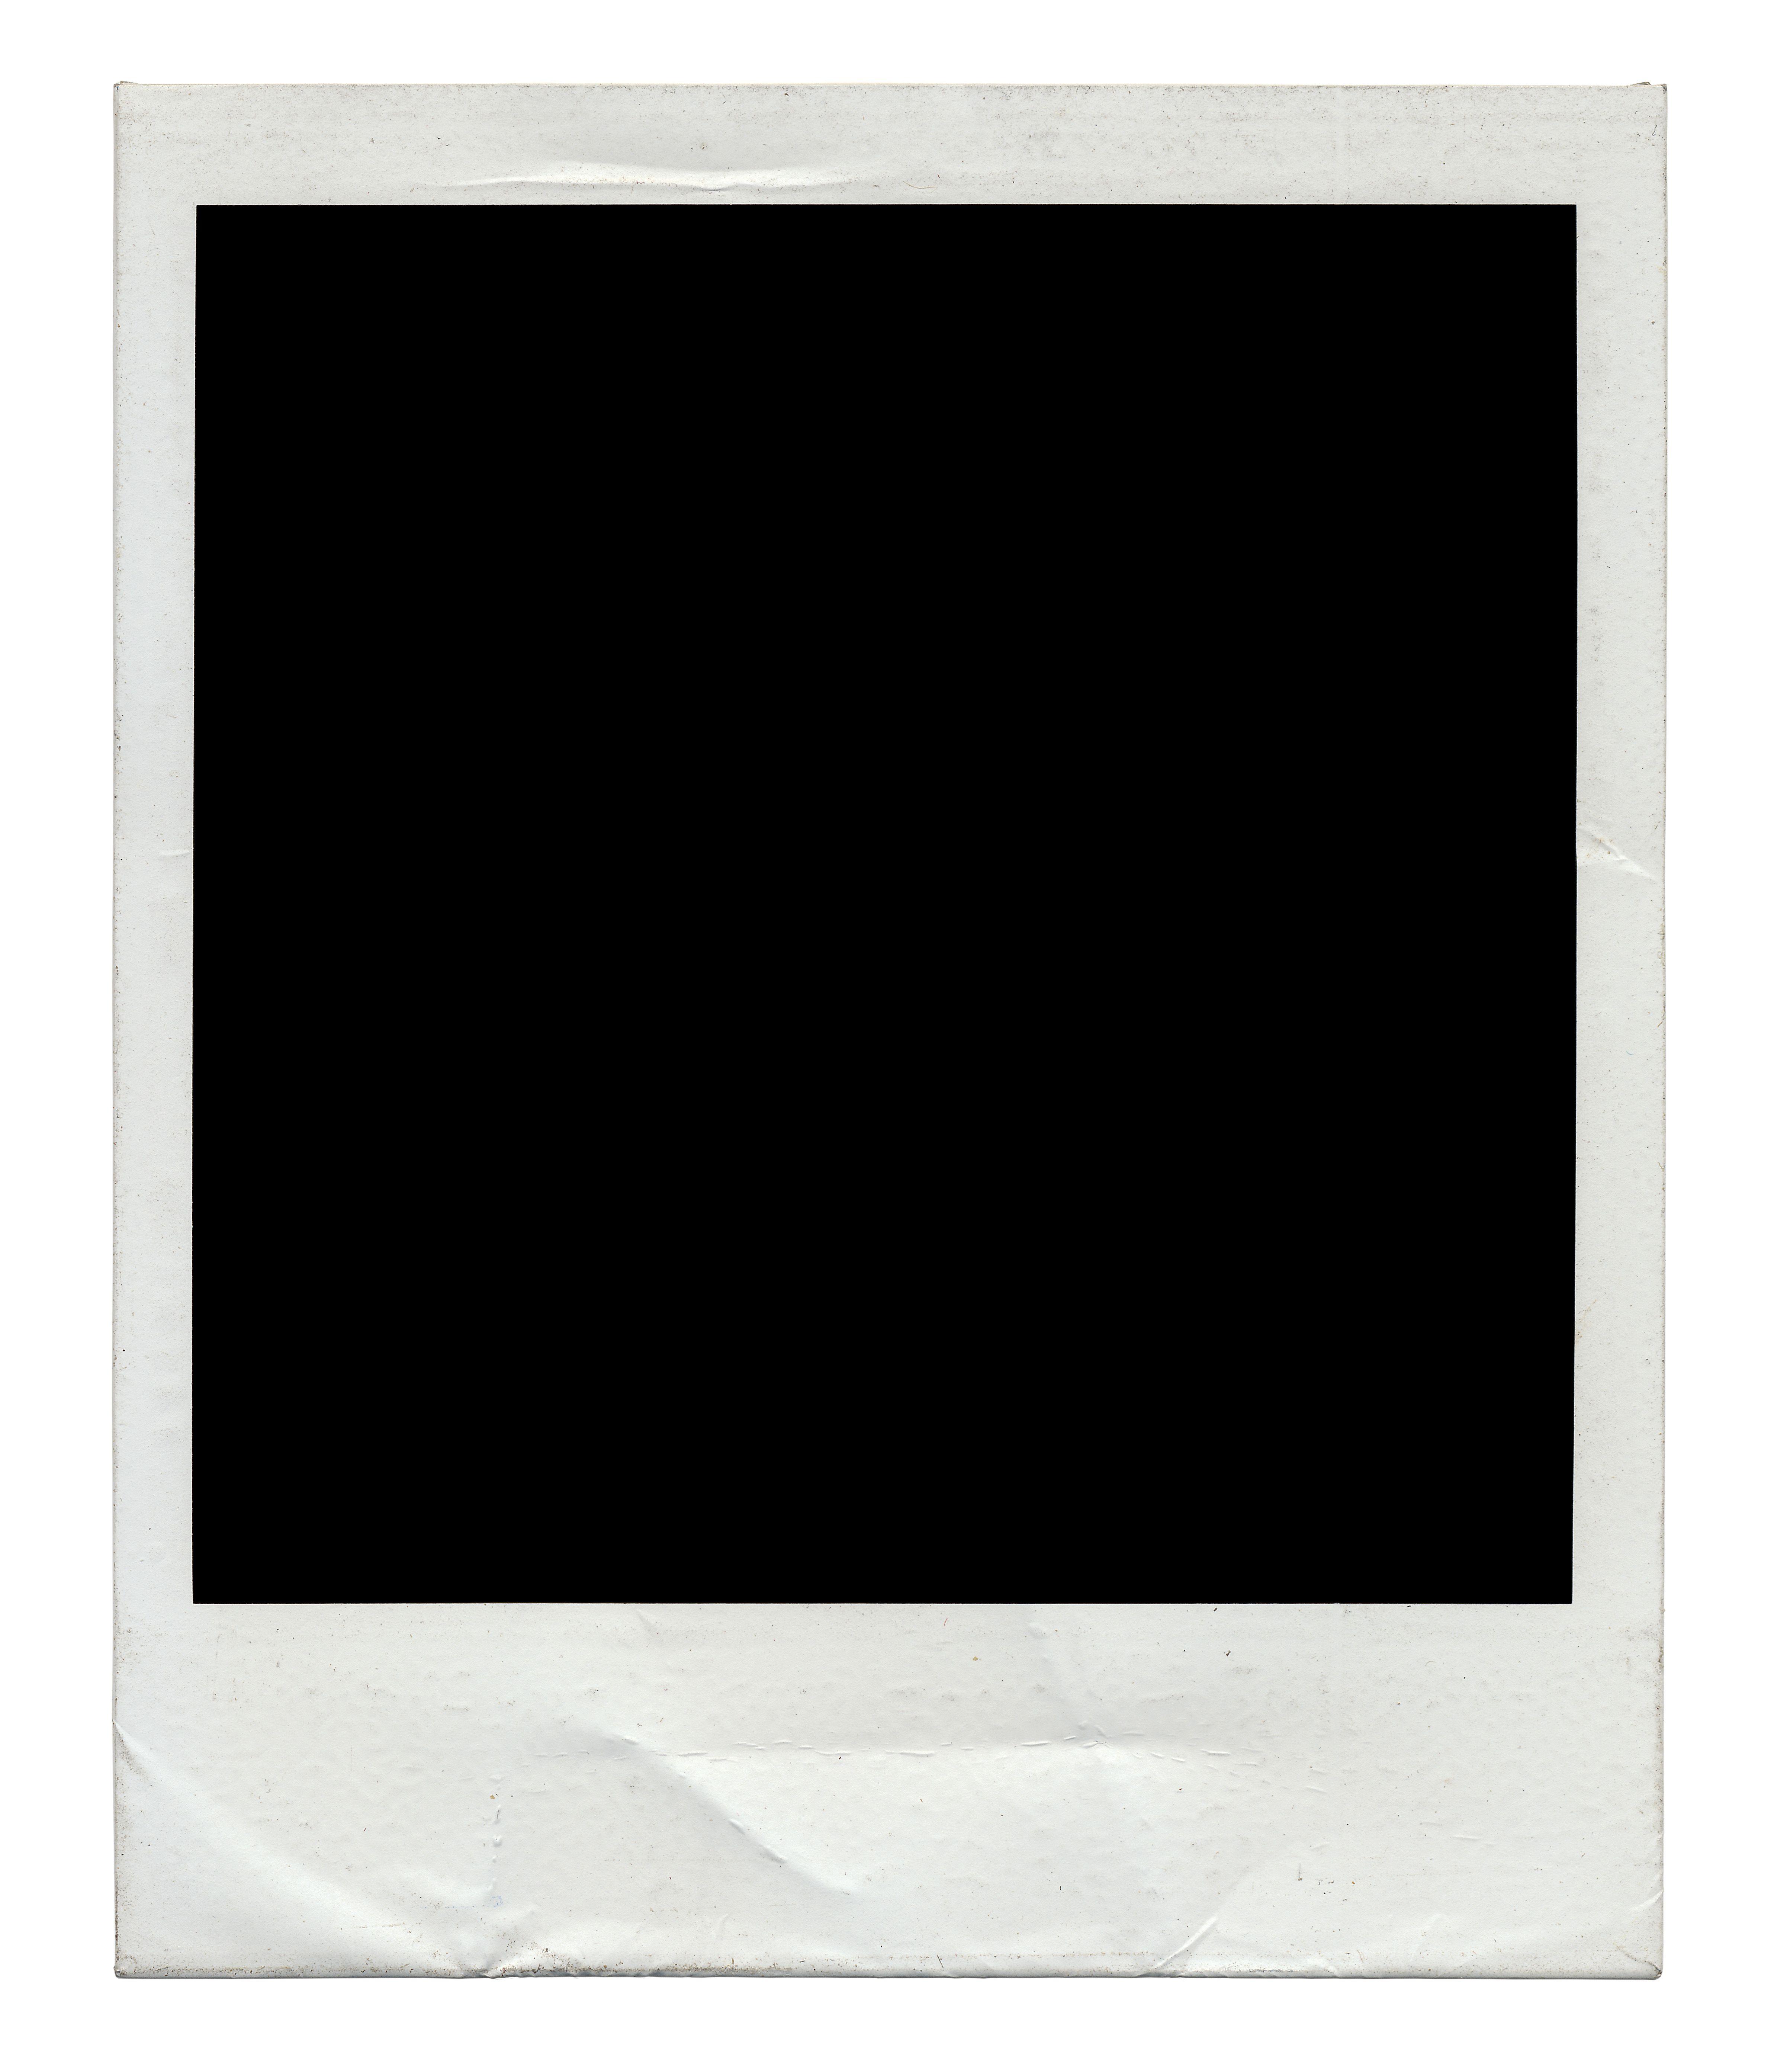 polaroid frames photographic collage pinterest polaroid frame polaroid and collage. Black Bedroom Furniture Sets. Home Design Ideas